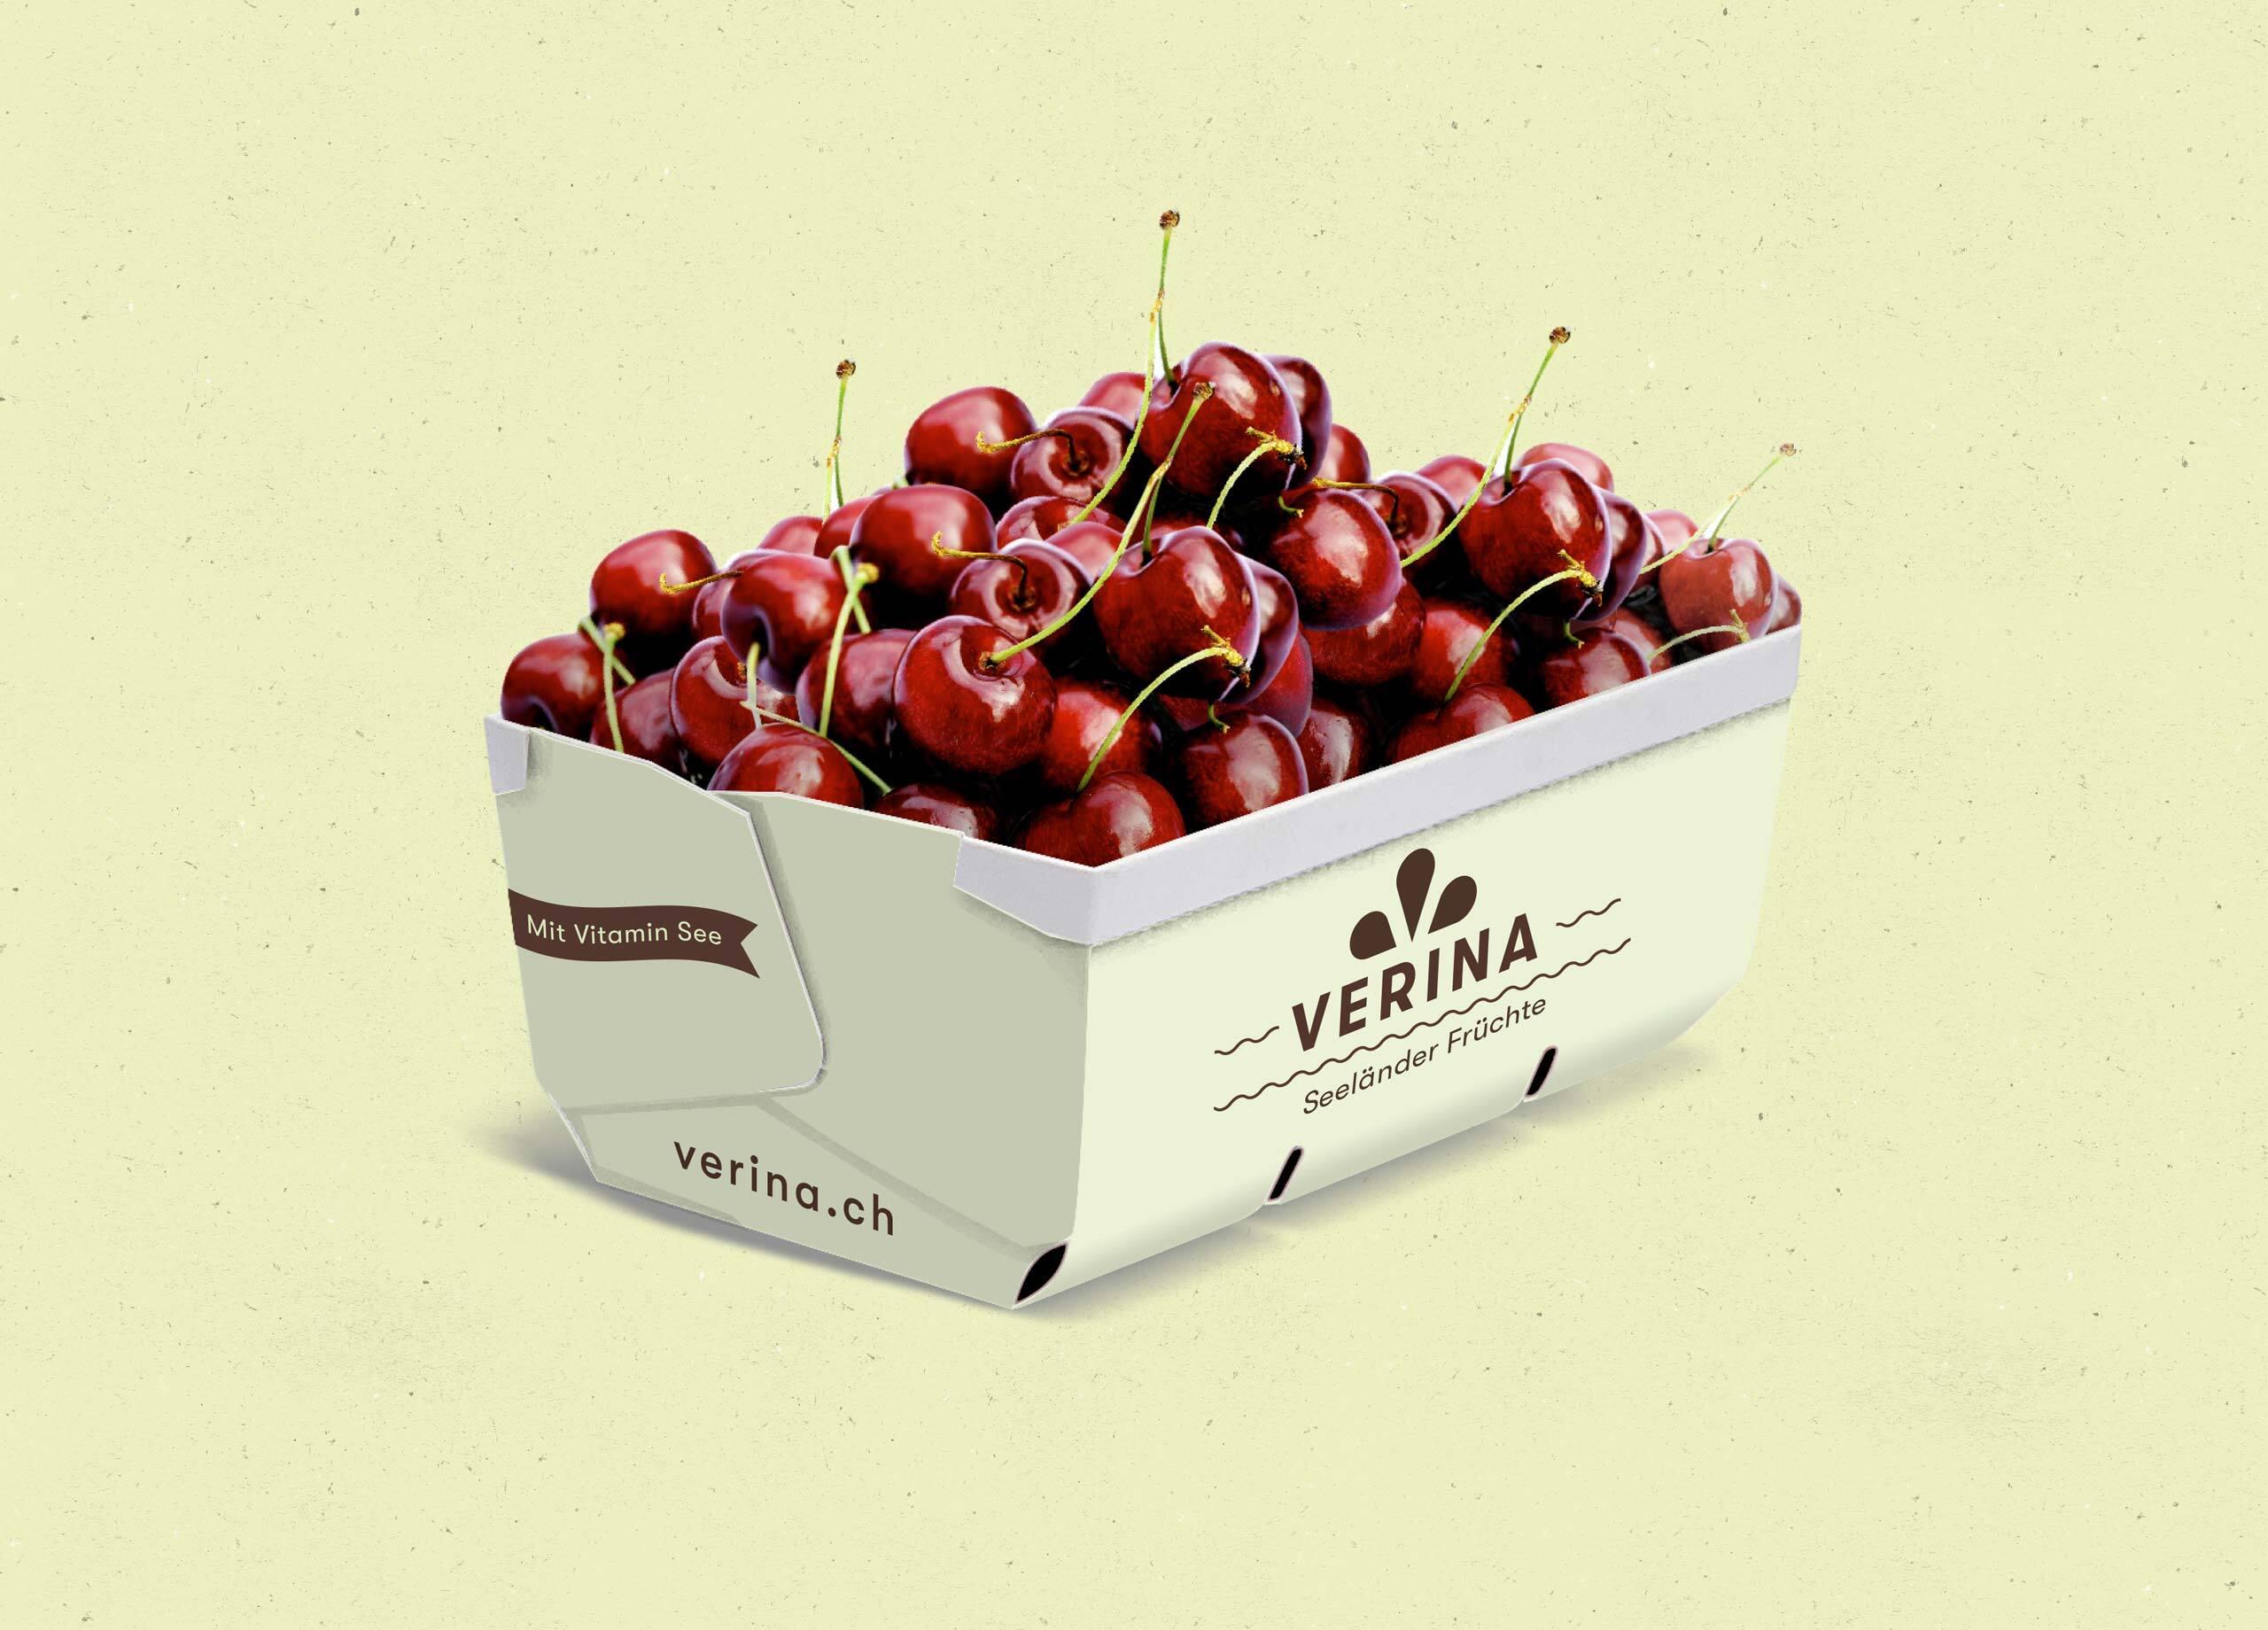 Verina Branding 05 01 MHG Bern